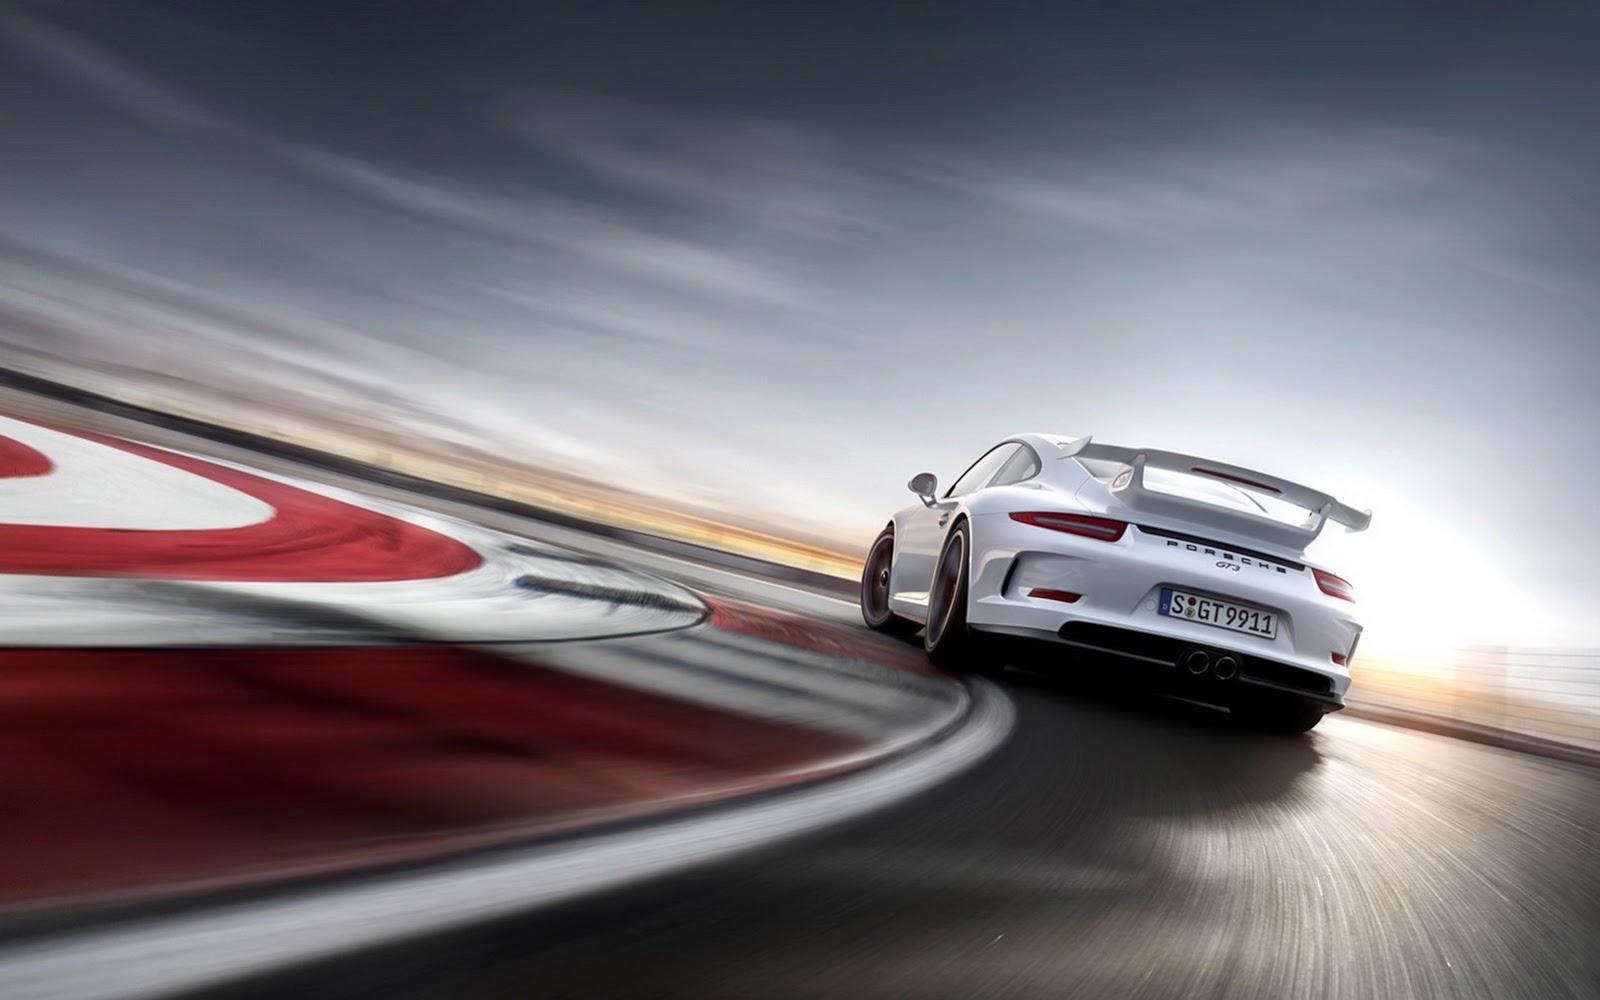 New Porsche 911 Gt3 Unveiled In Geneva Autoevolution